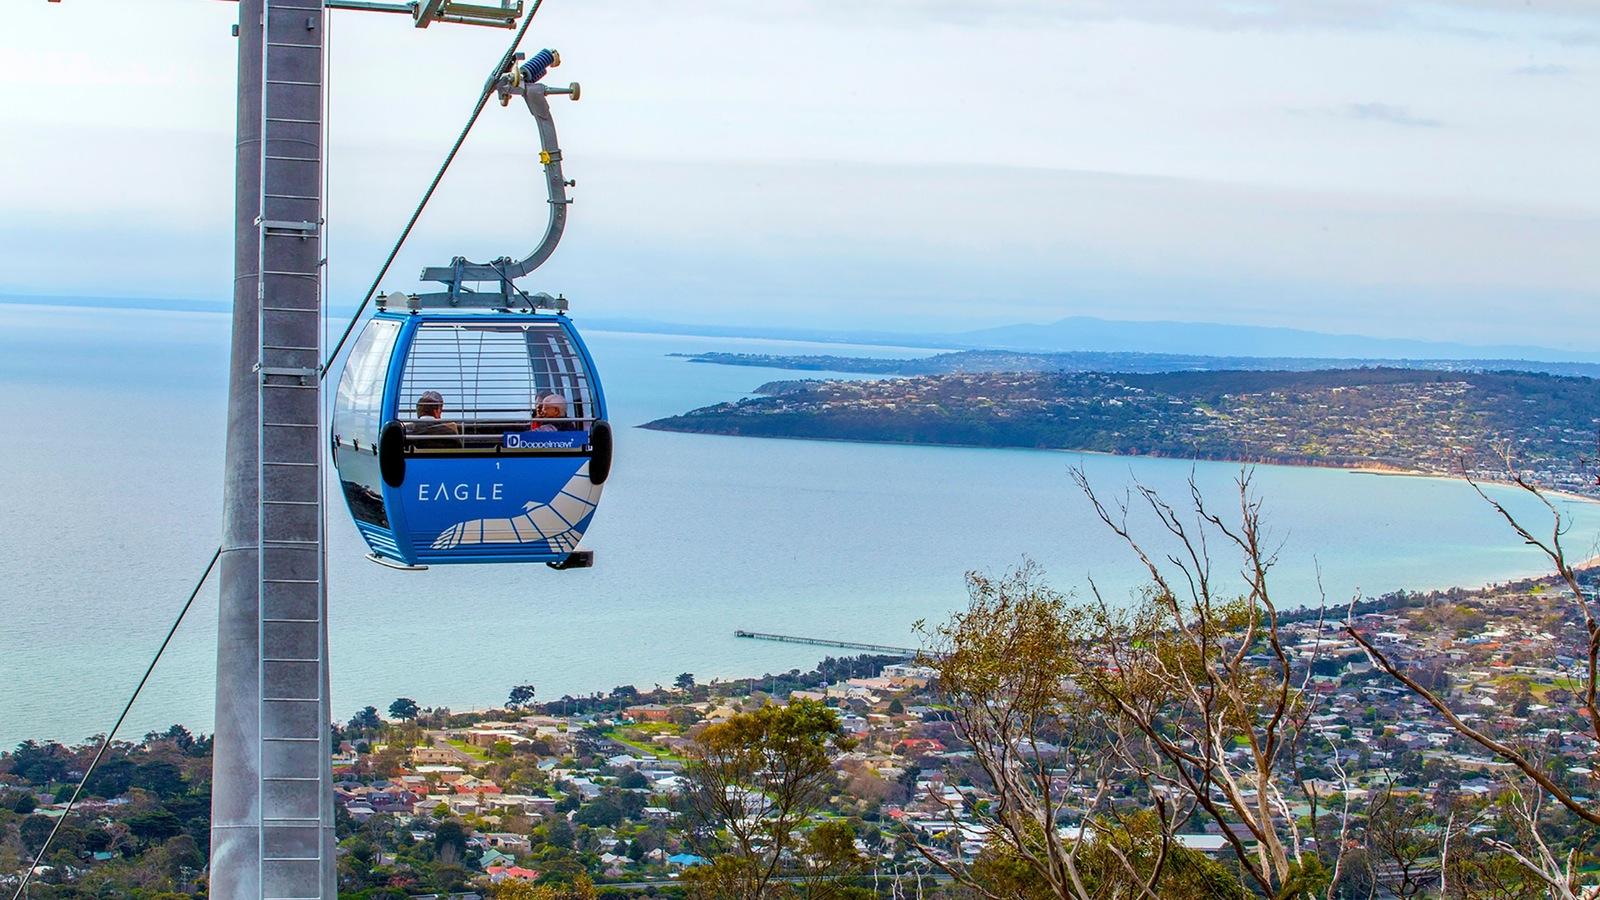 Arthurs Seat Eagle Attraction Mornington Peninsula Victoria